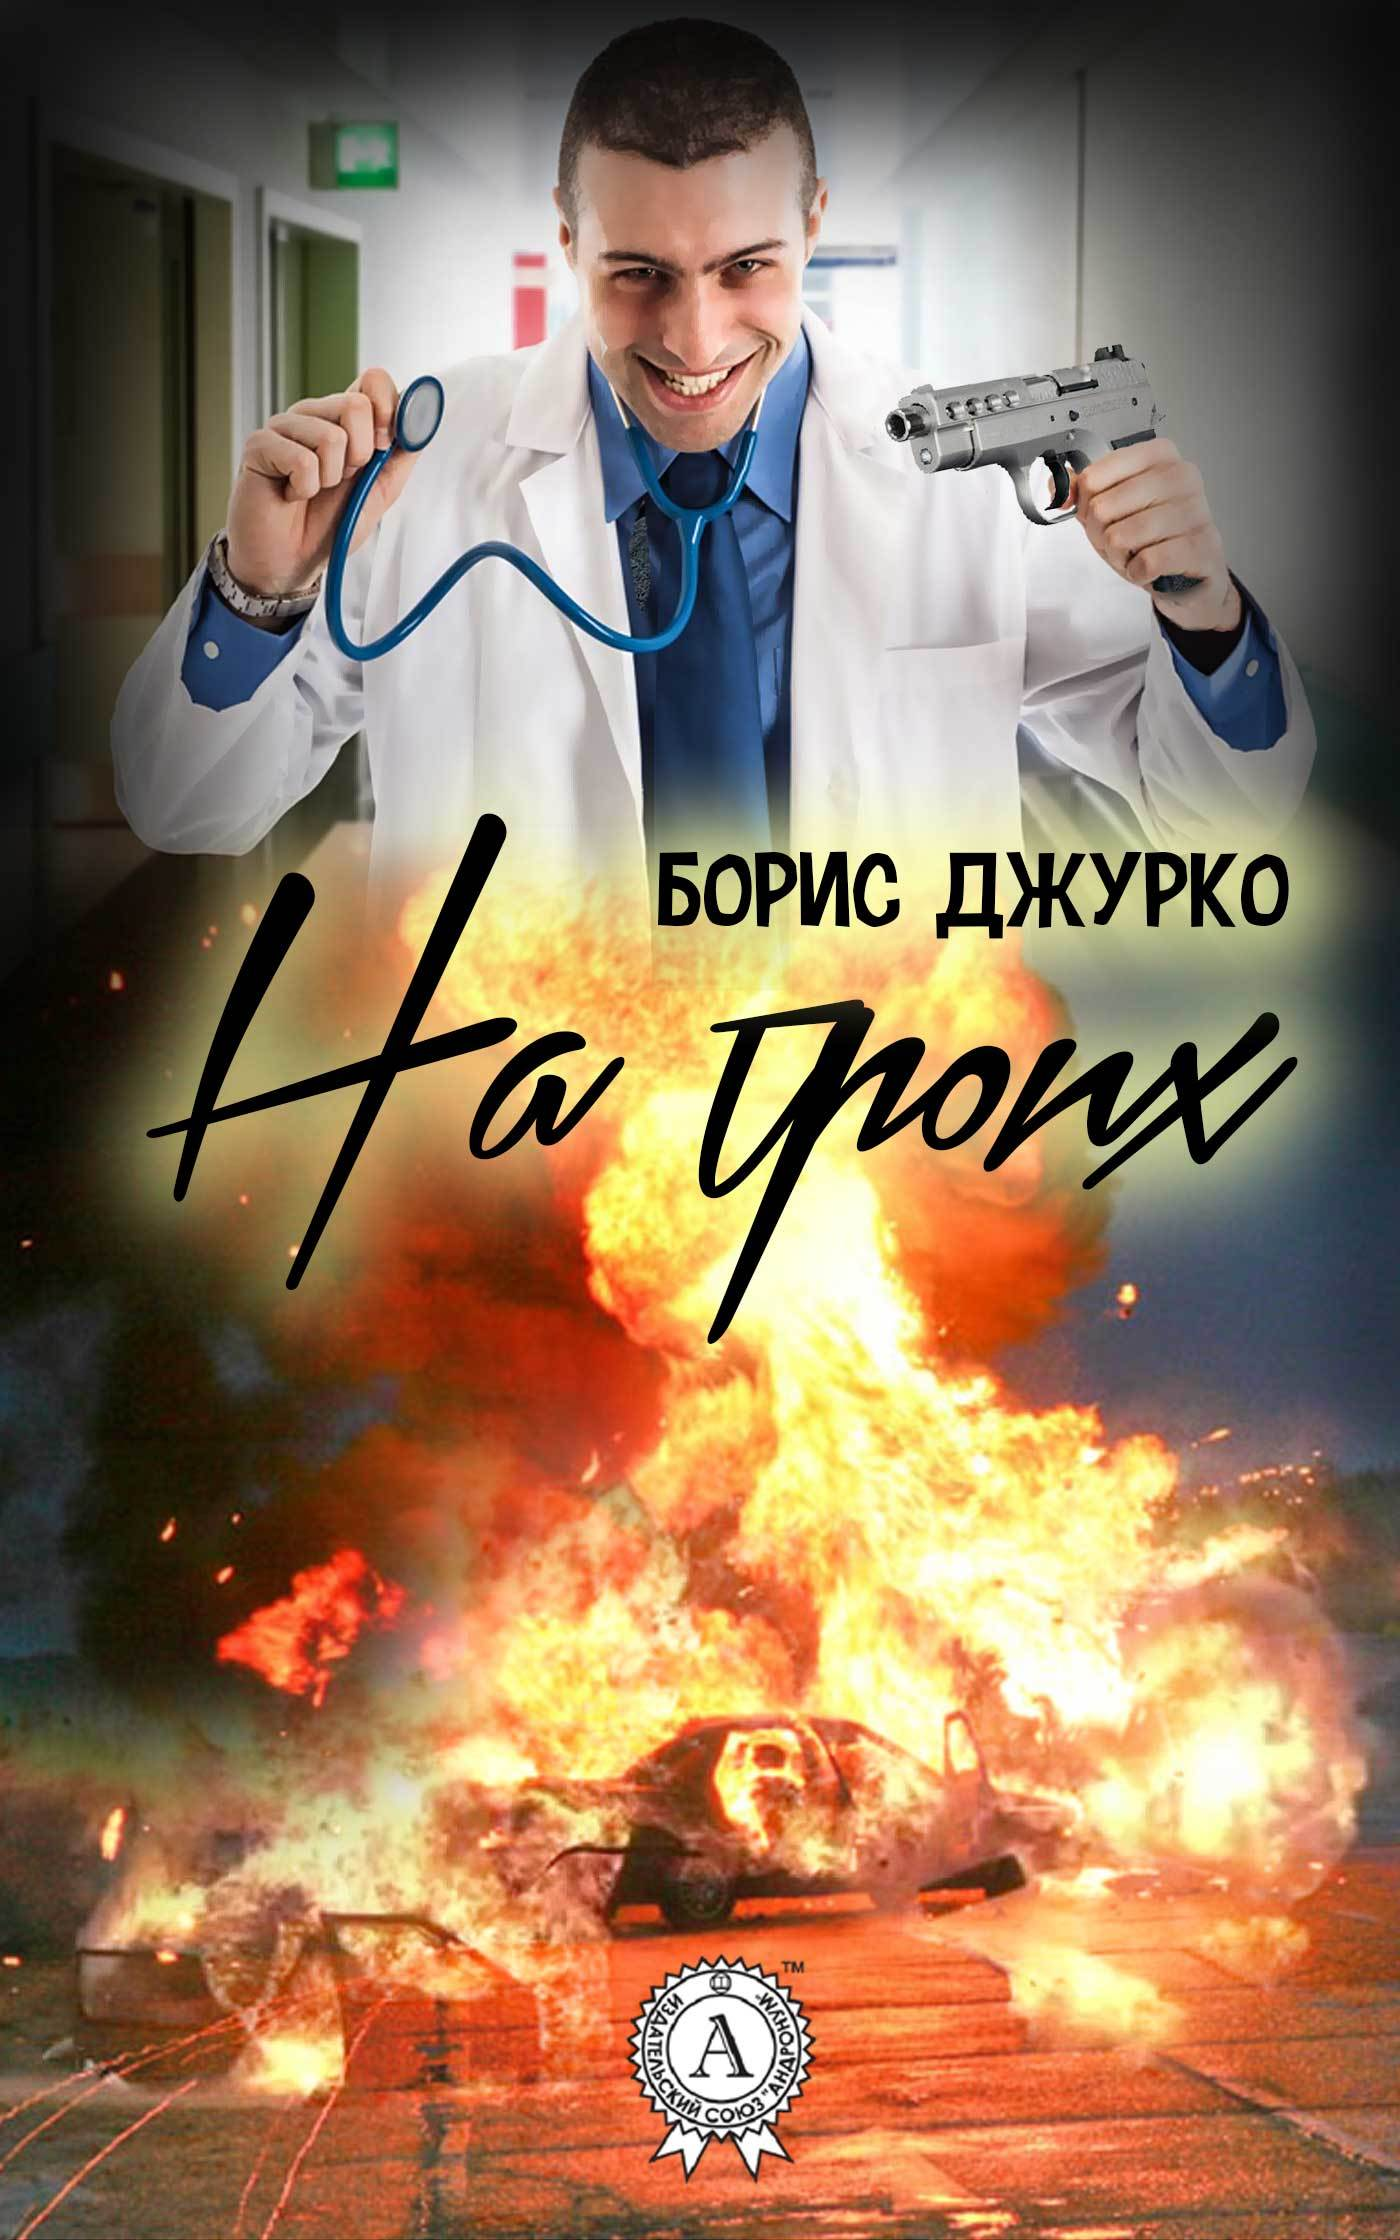 Борис Джурко На троих купероз на теле